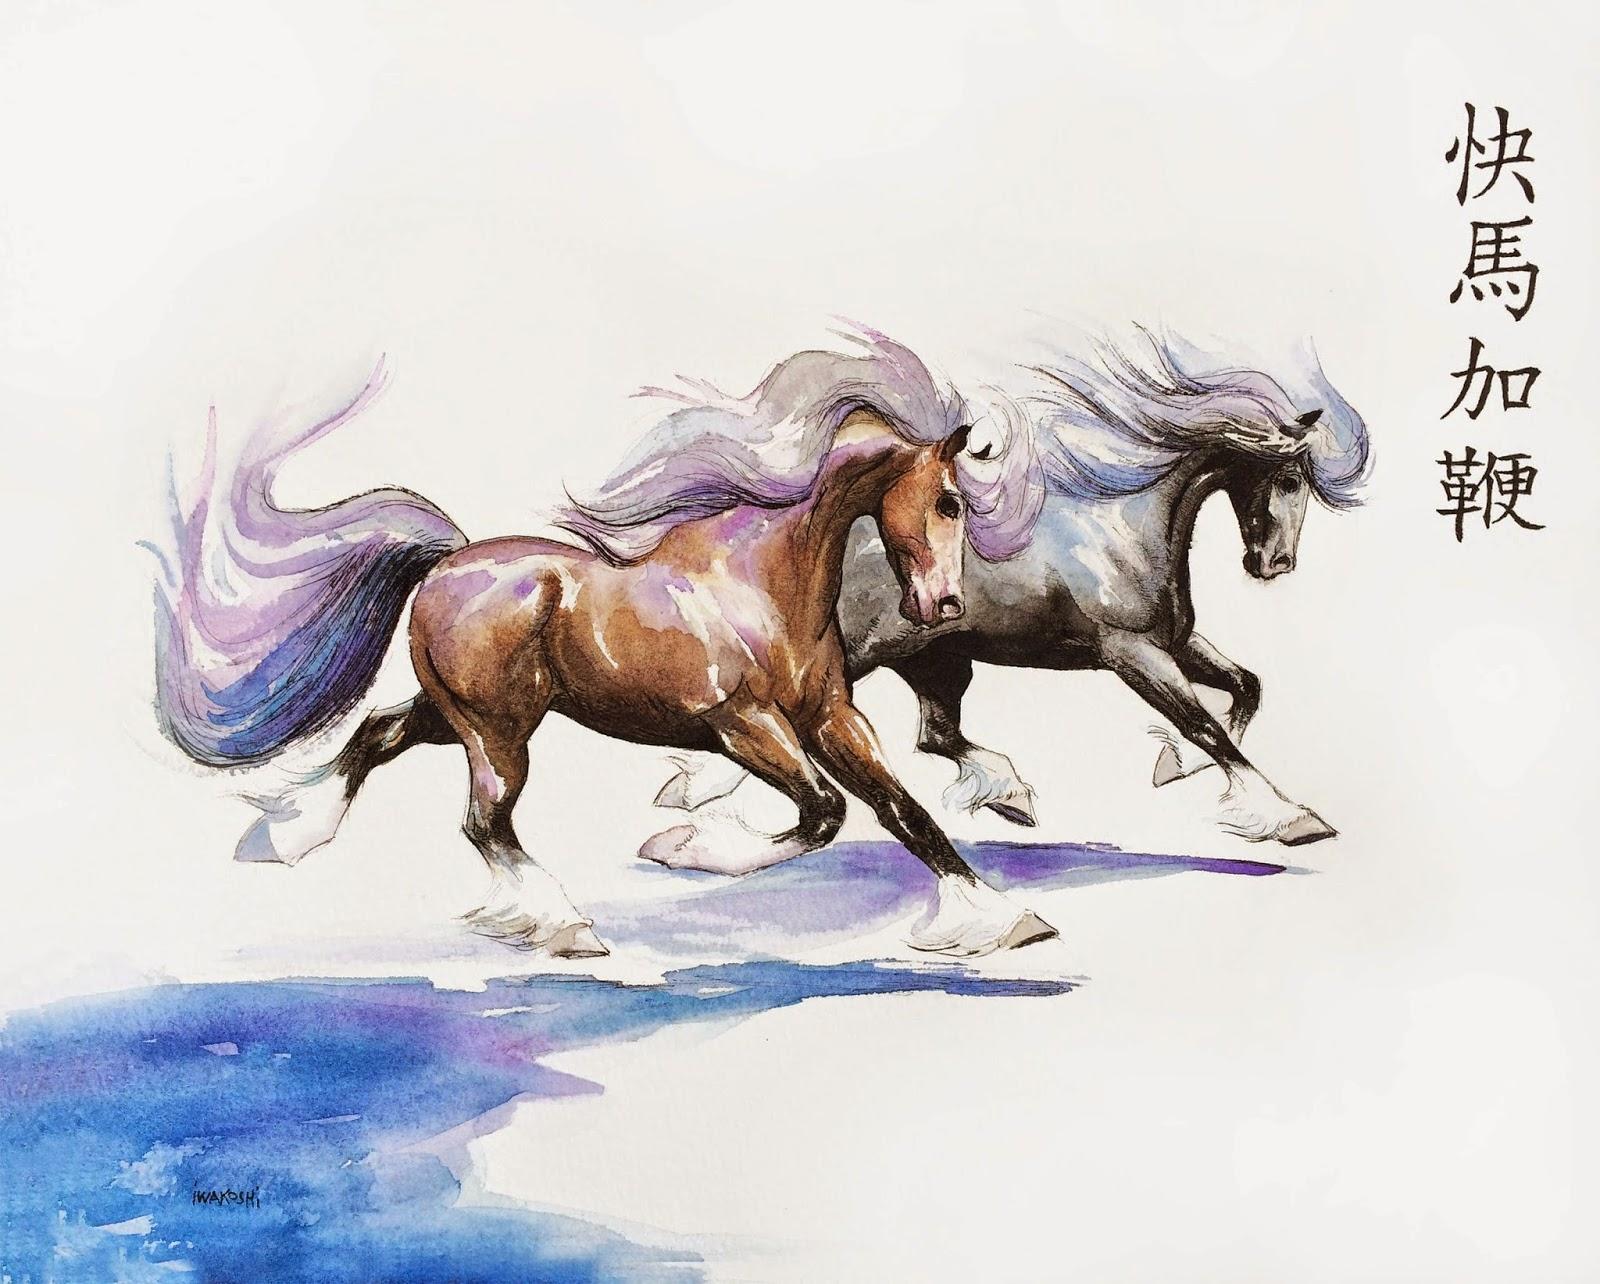 Cool   Wallpaper Horse Watercolor - AlaskArtEtsy  HD_85837.jpg